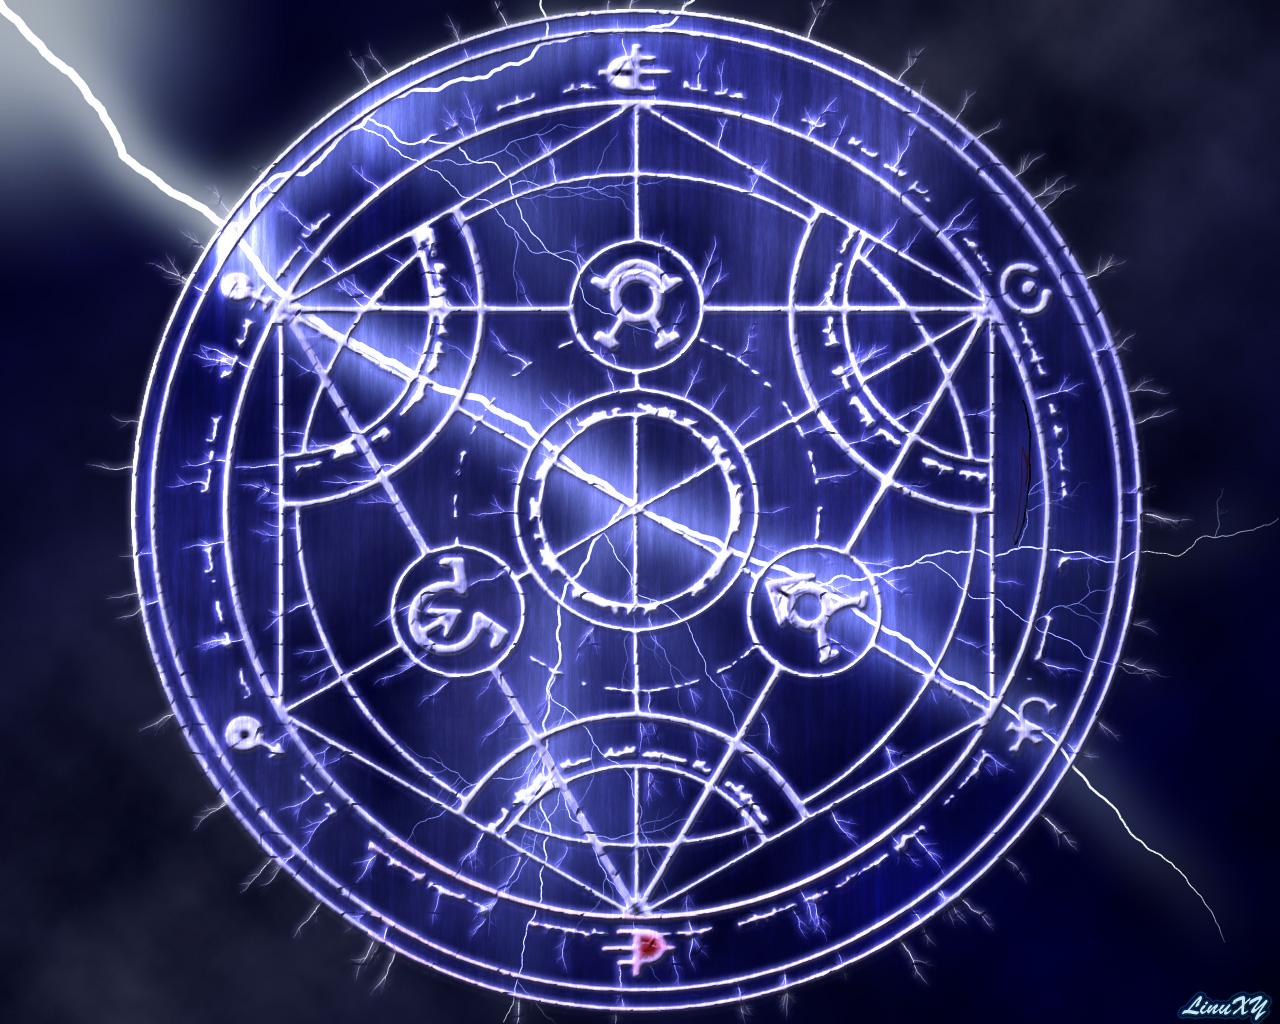 Alchemist Quotes Wallpaper 640 Fullmetal Alchemist Hd Wallpapers Backgrounds